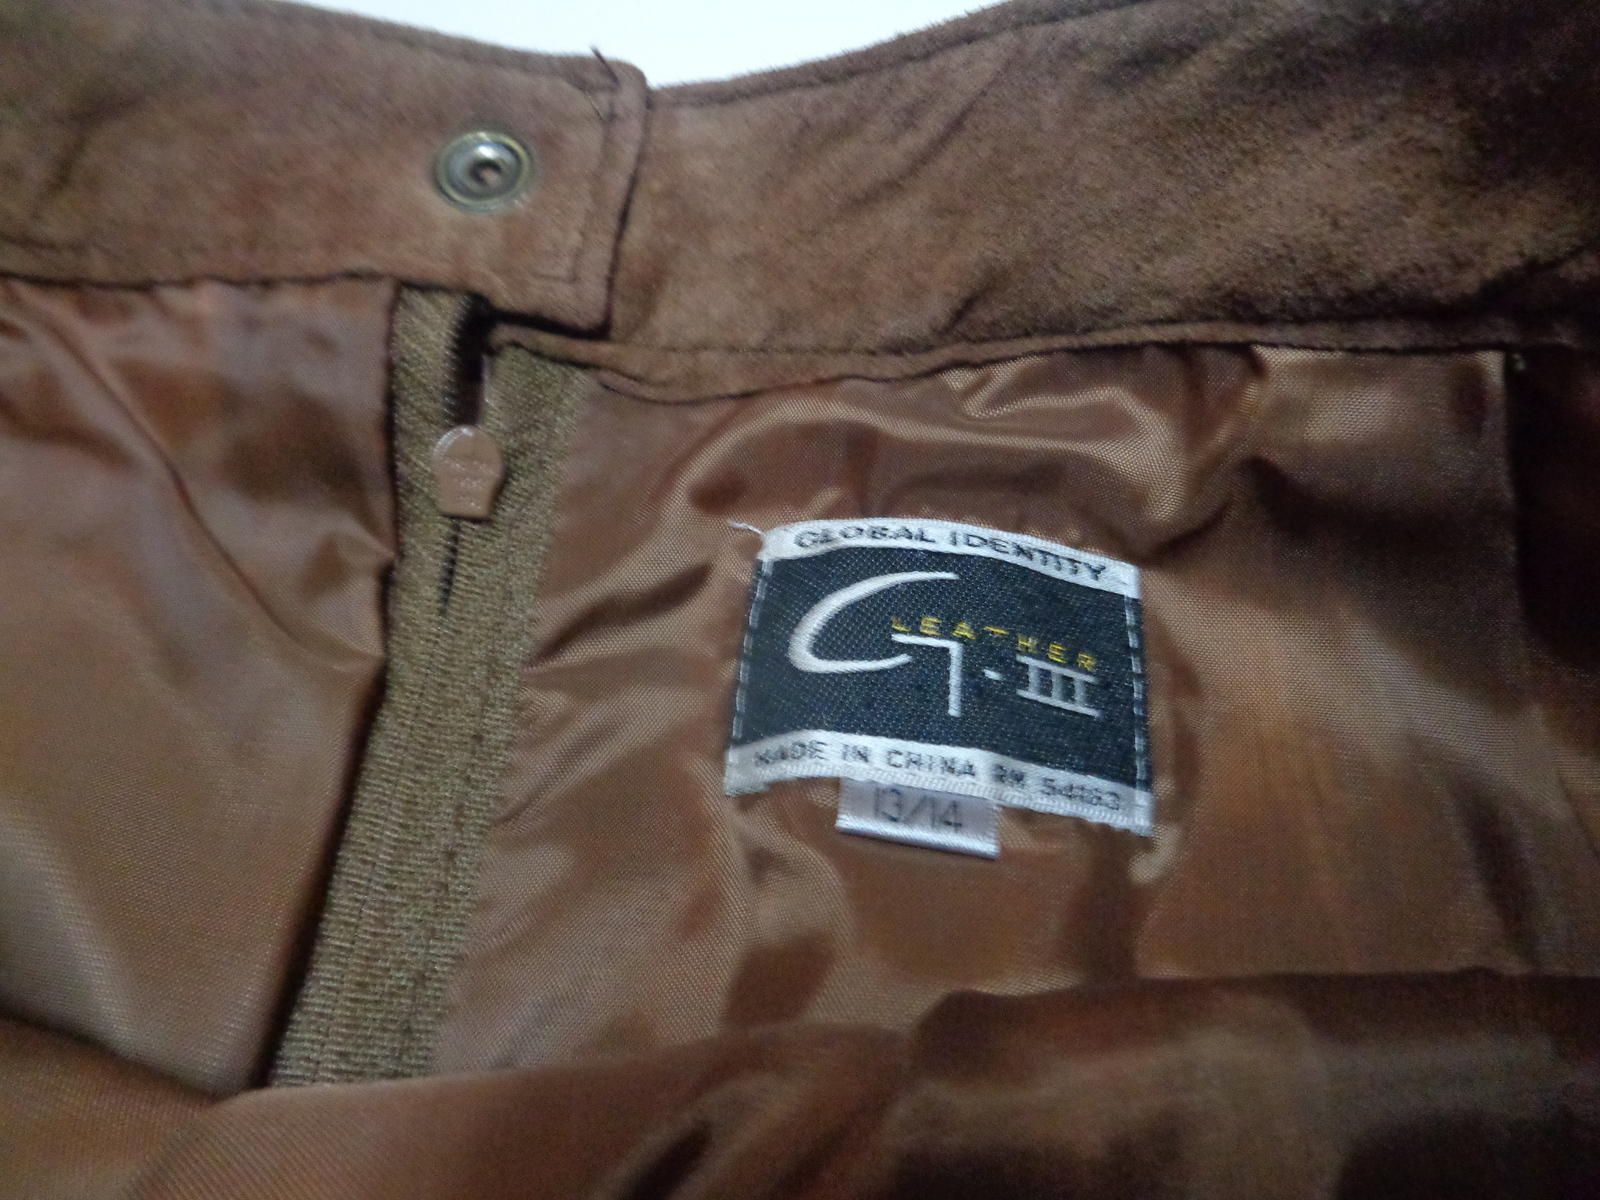 Global Identity Brown Genuine Suede Leather Skirt NWT Sz 13/14